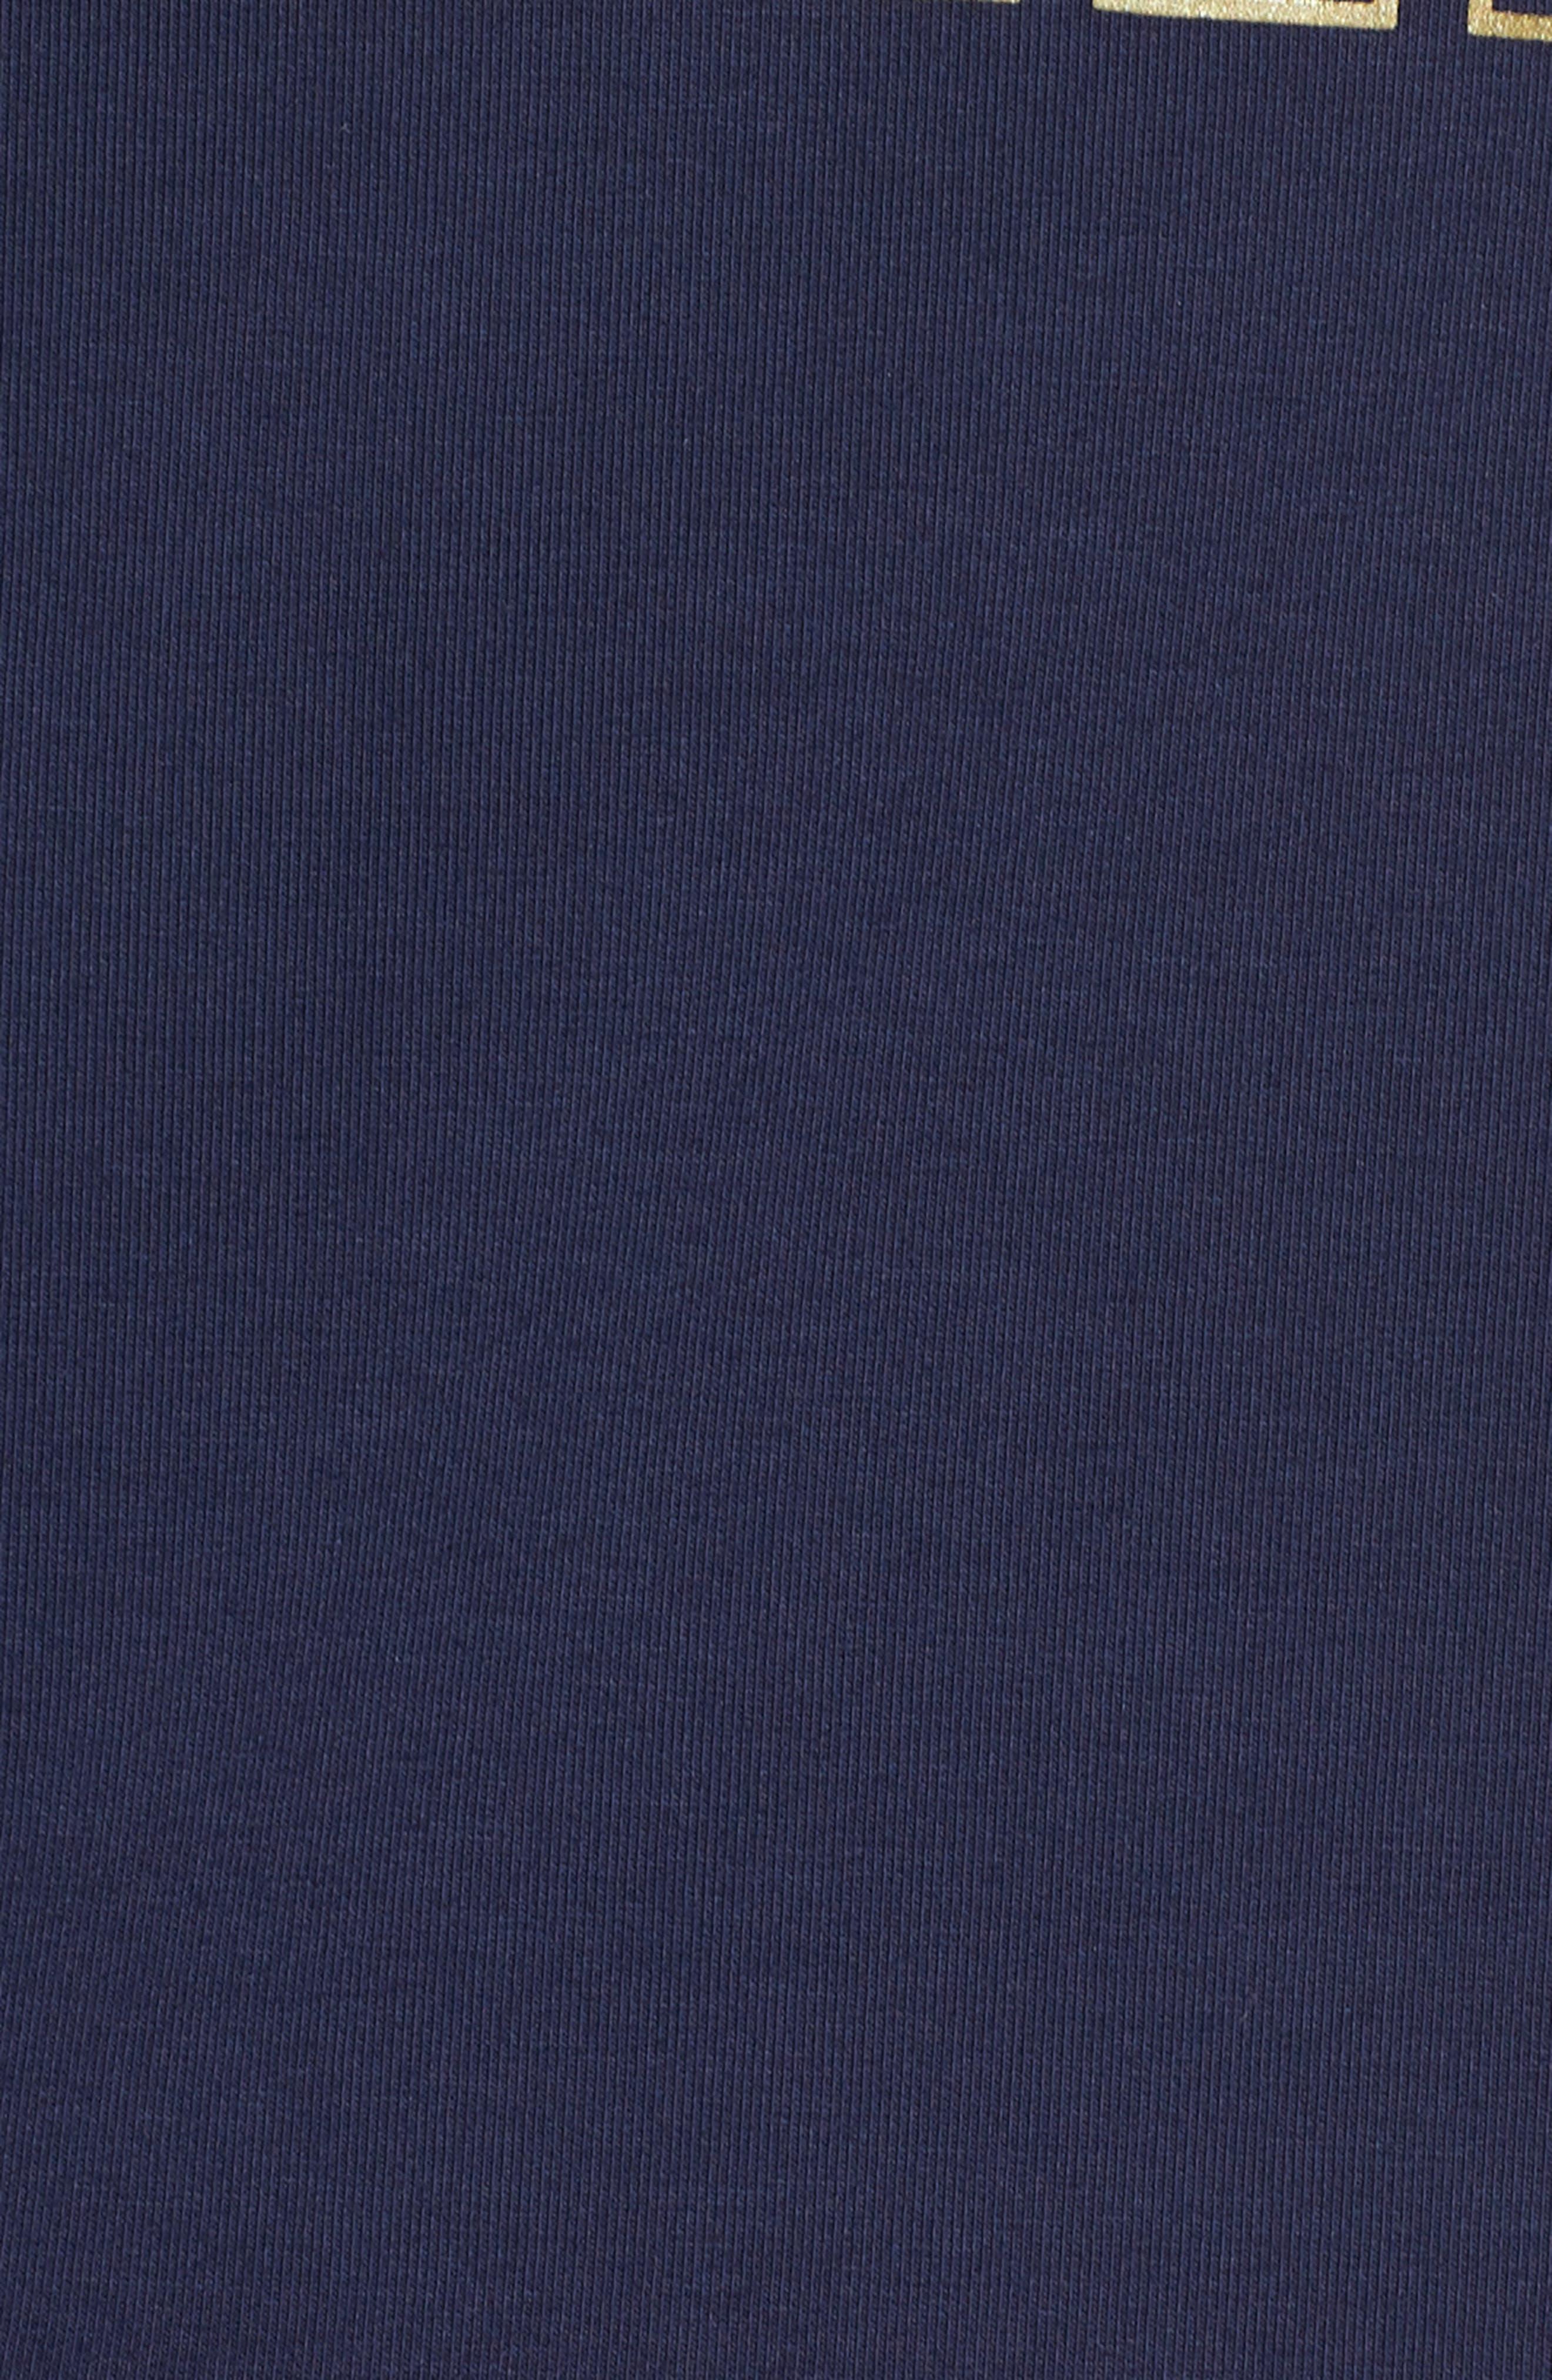 Modern Sport Sweatshirt,                             Alternate thumbnail 6, color,                             710